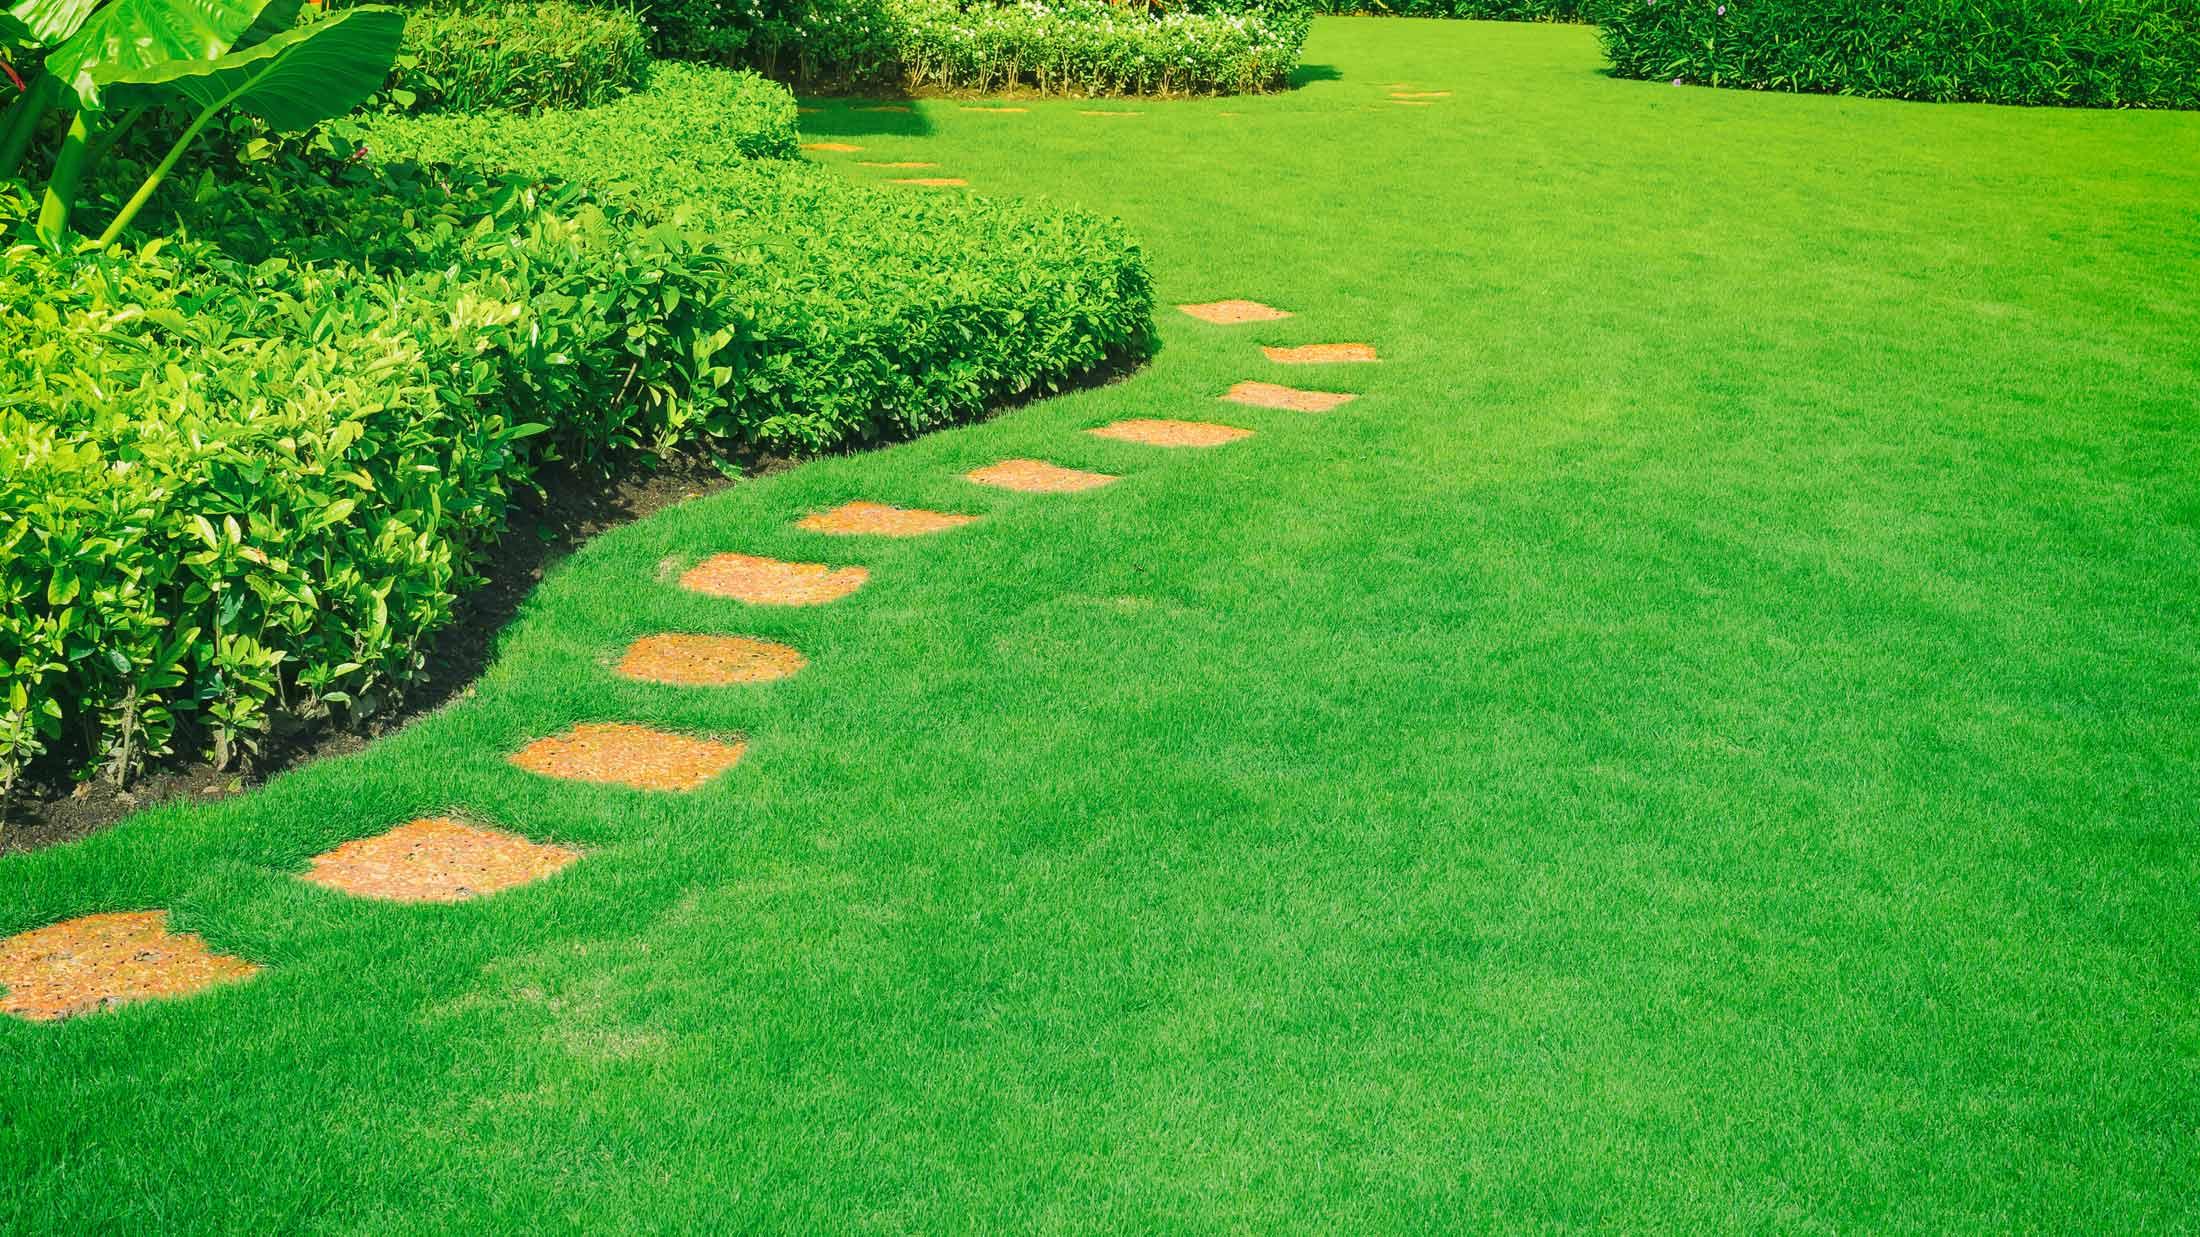 Does Your Landscape Have Room for Improvement?